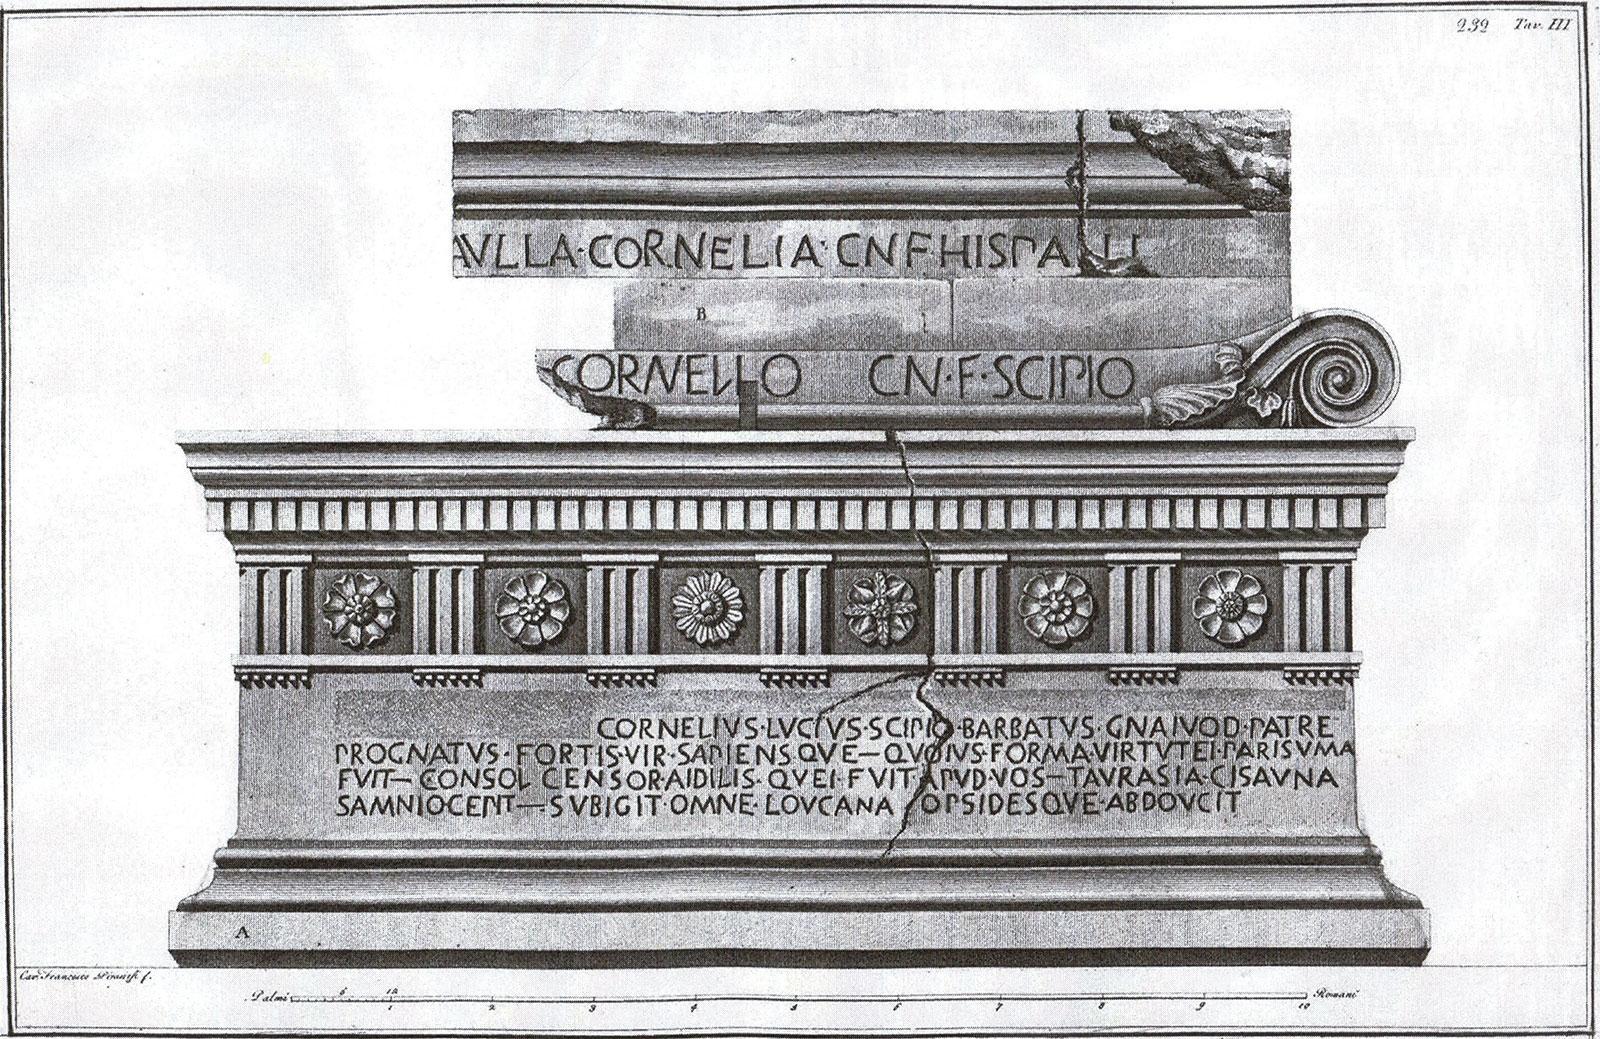 Engraving of the Scipio Barbatus sarcophagus by Piranesi